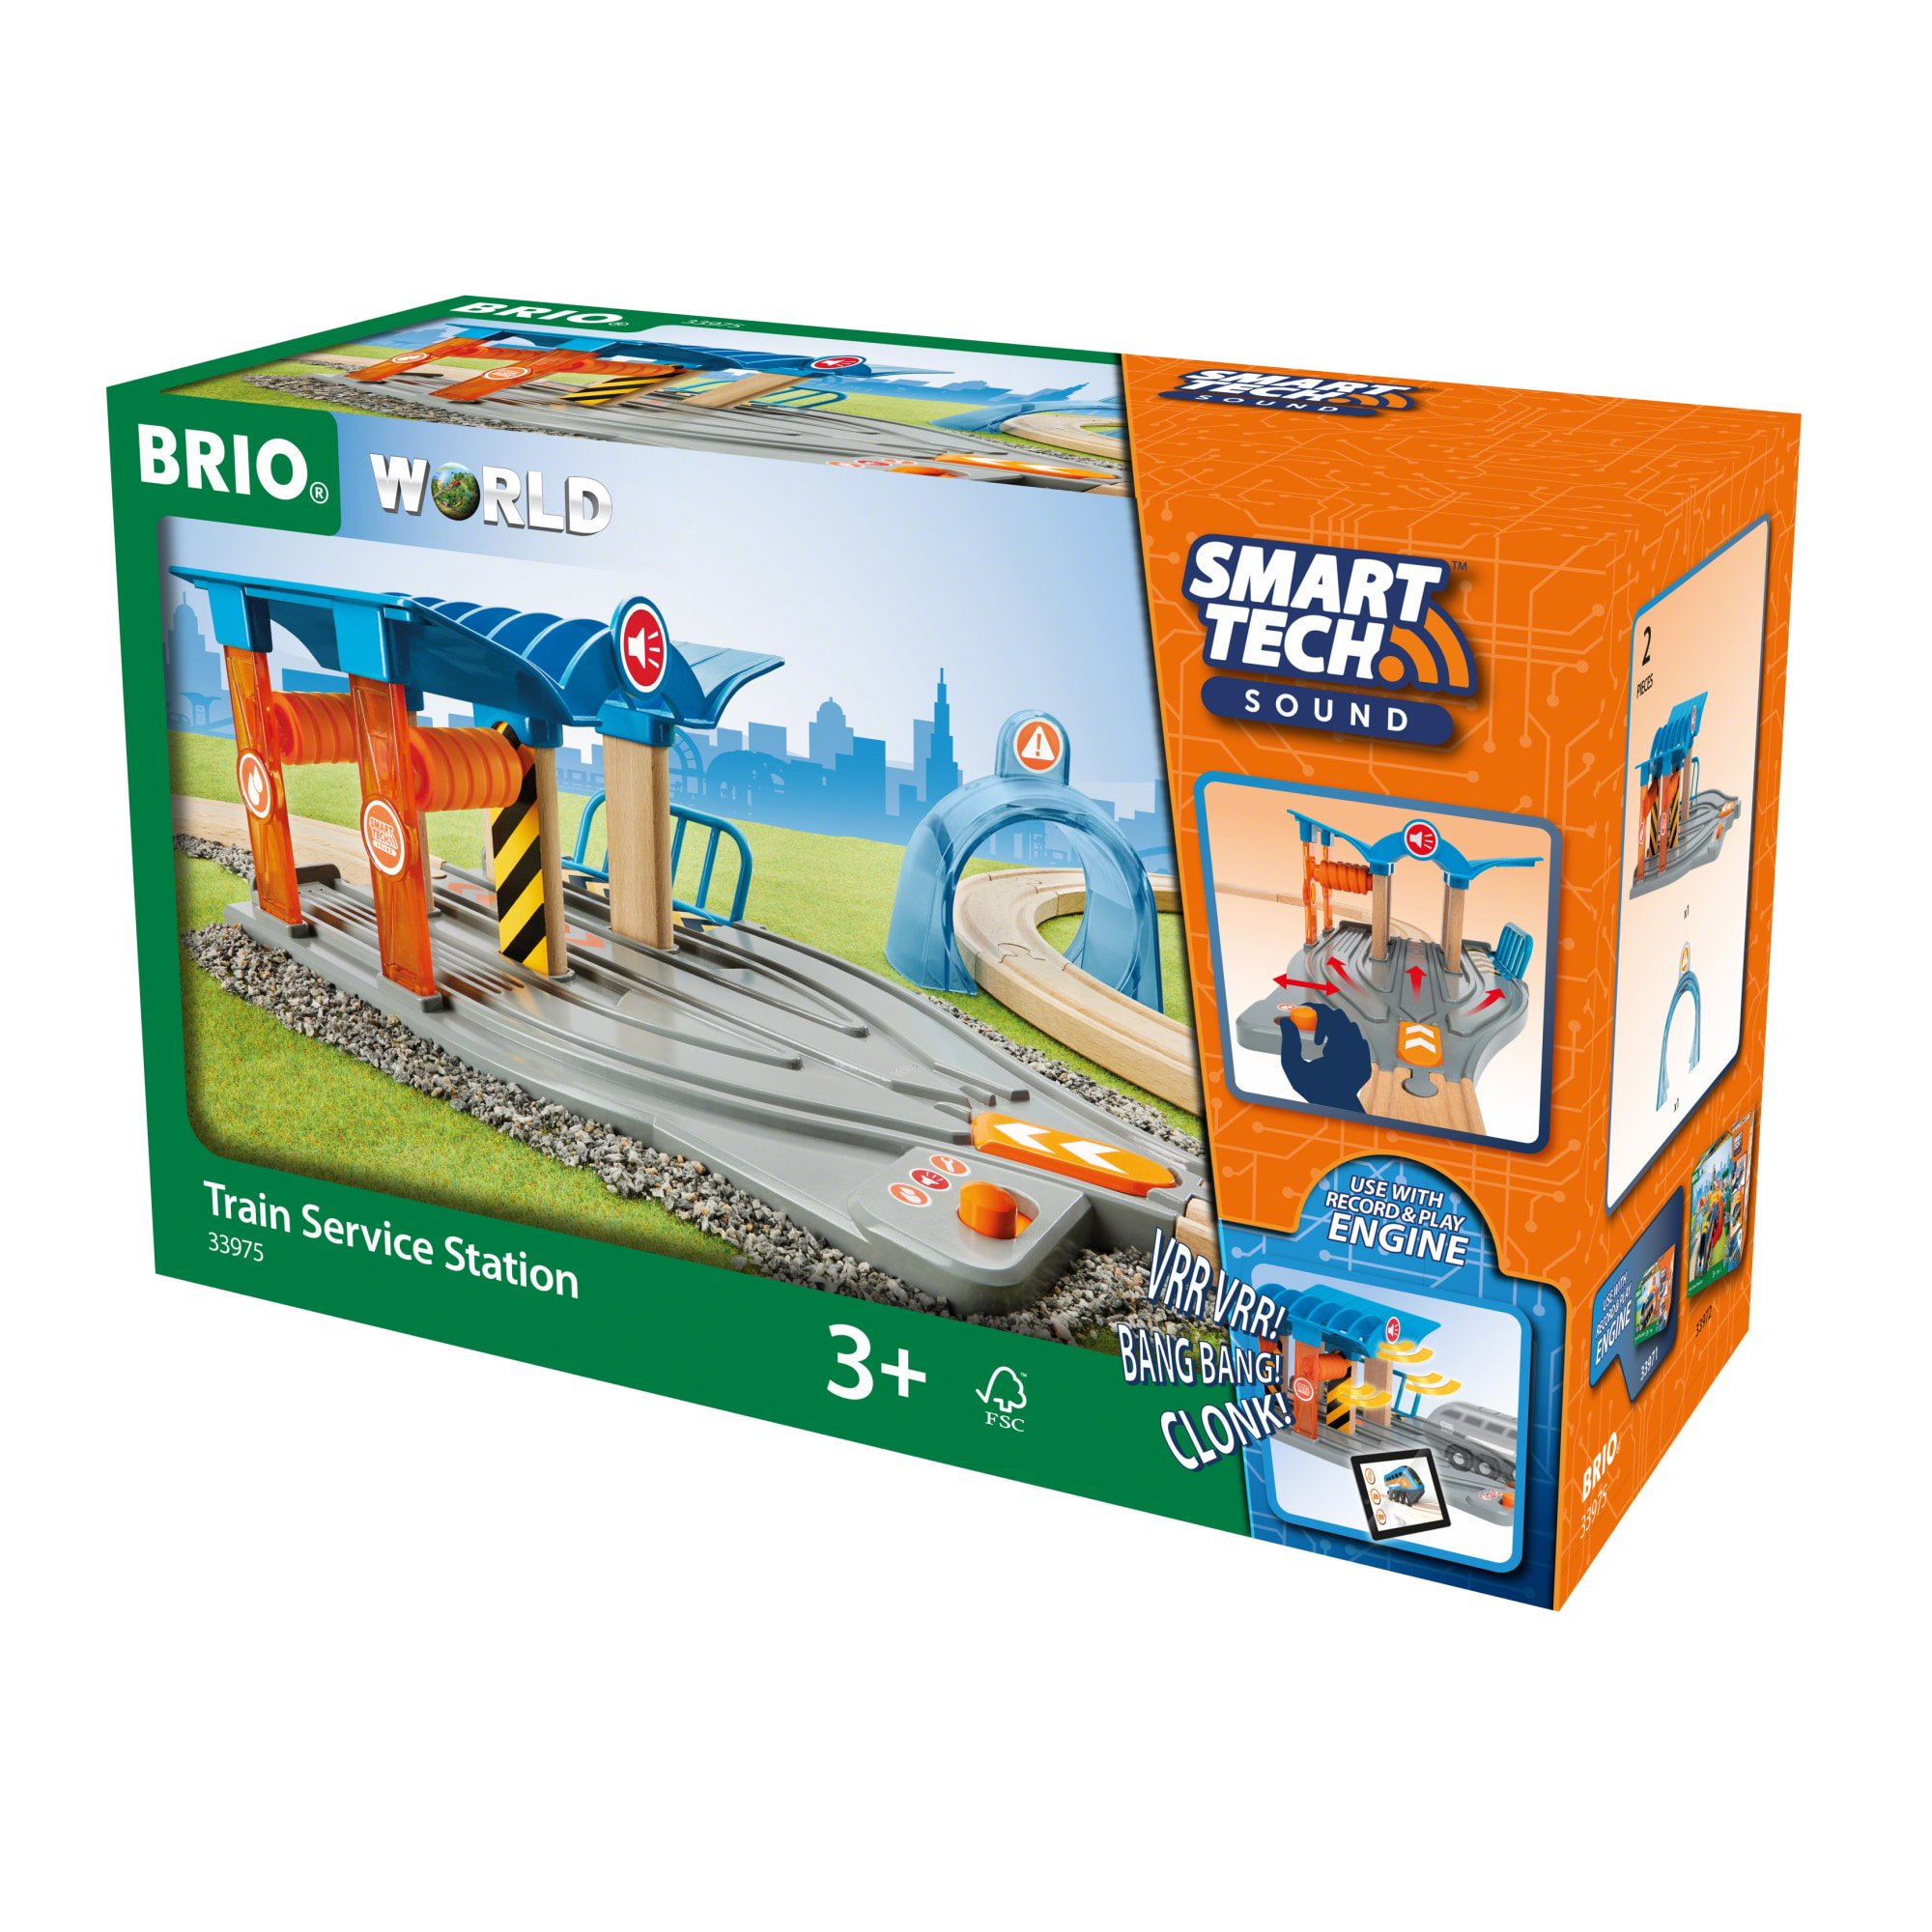 BRIO - Smart Tech Sound Togservicestation (4-33975)